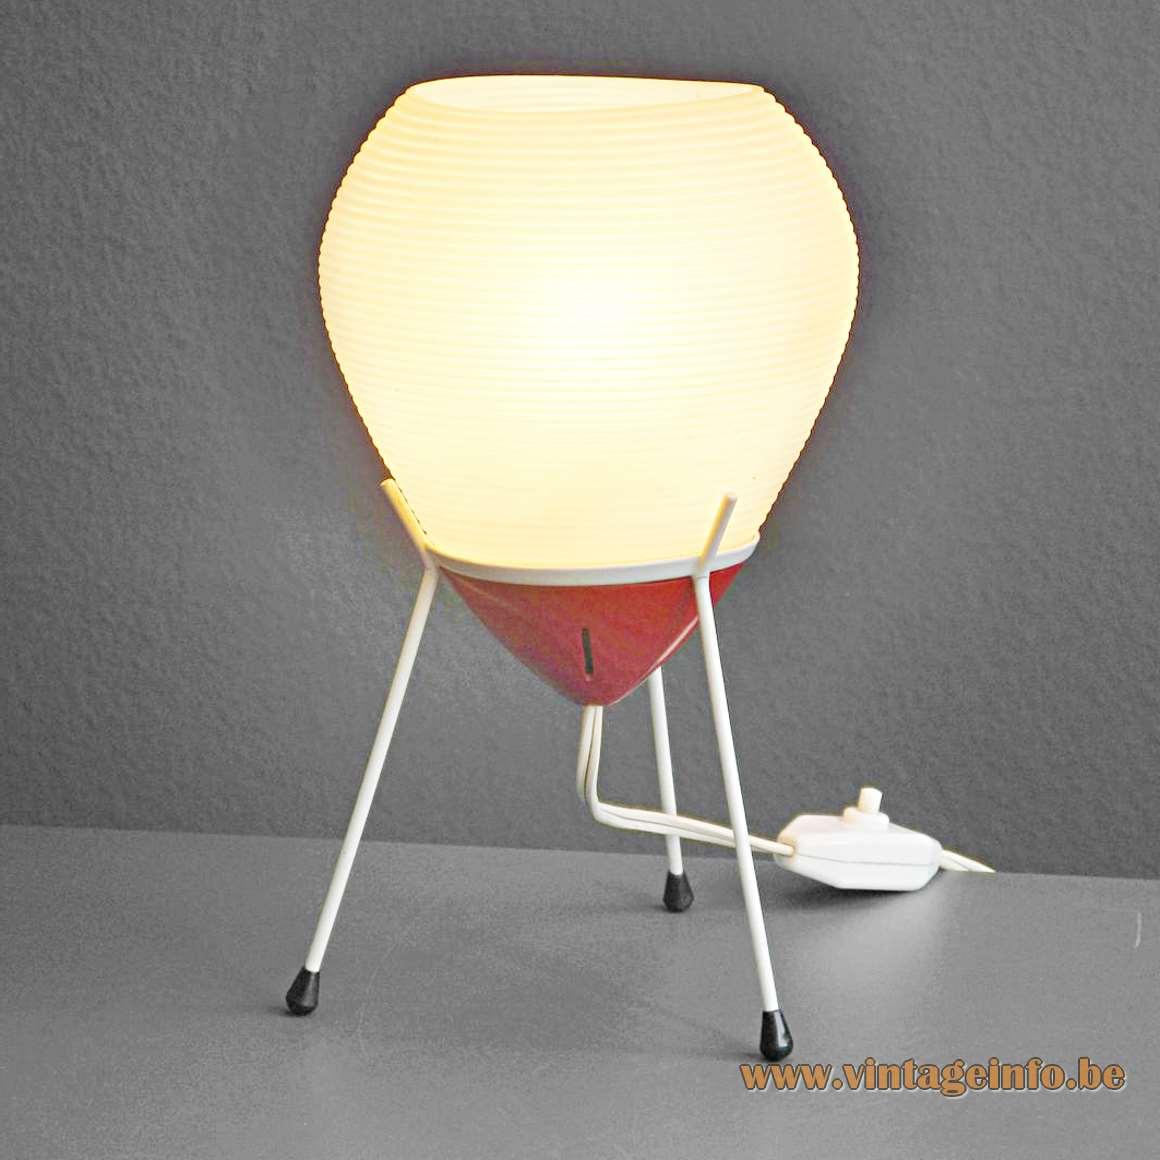 Rotaflex Tripod Table Lamp